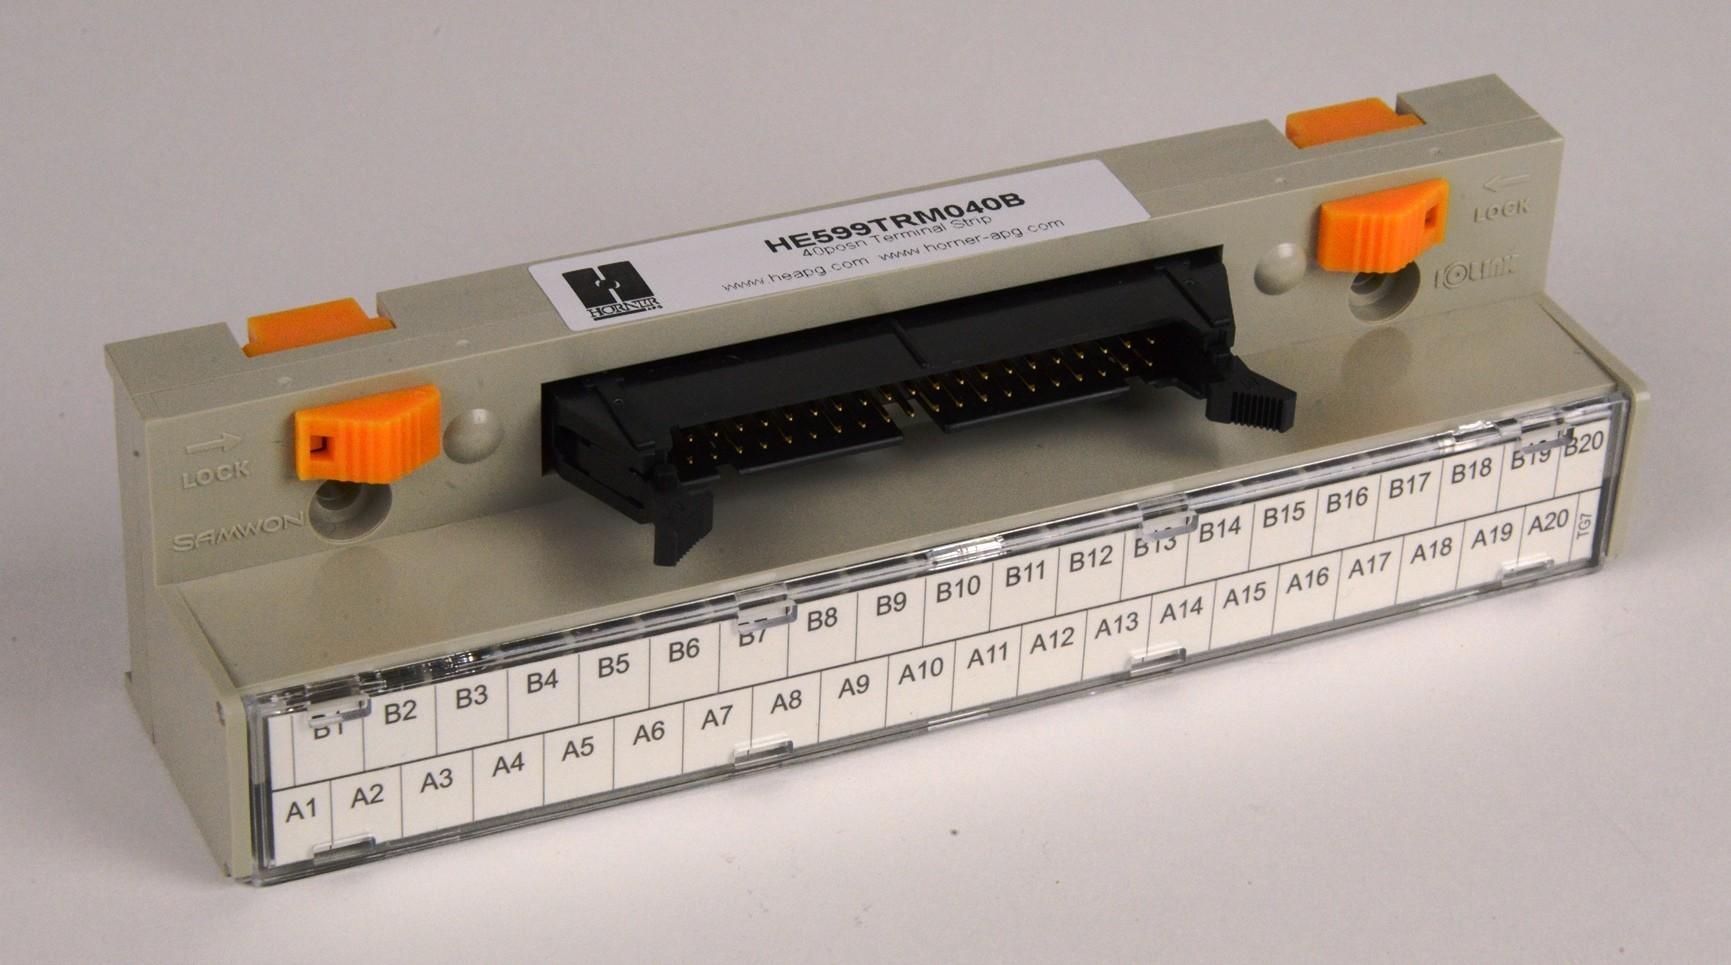 40 Pin, DIN-rail Terminal Strip - SmartLink